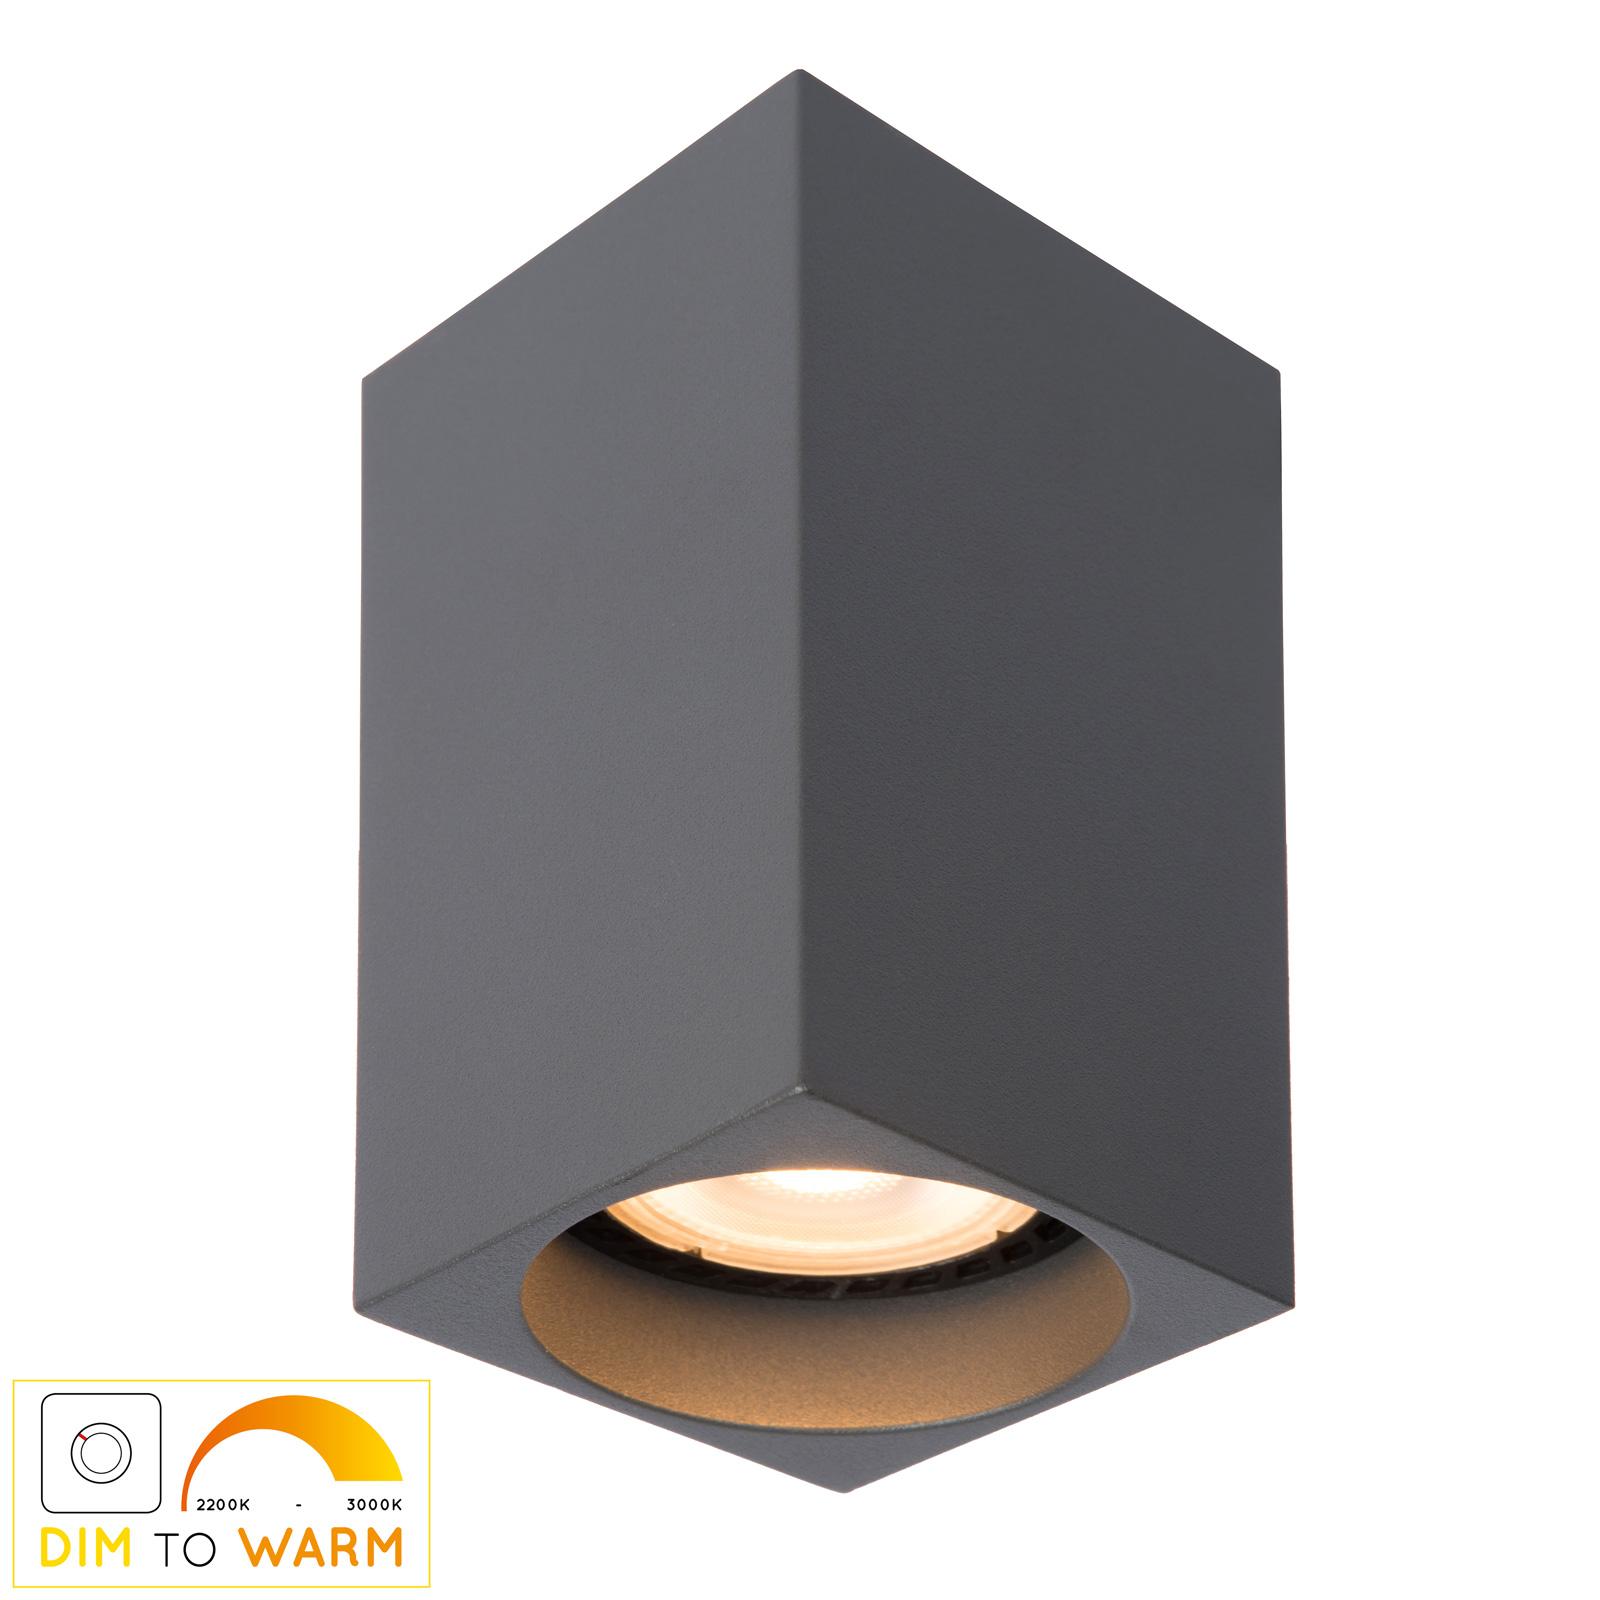 Lampa sufitowa LED Delto dim to warm kątowa, szara